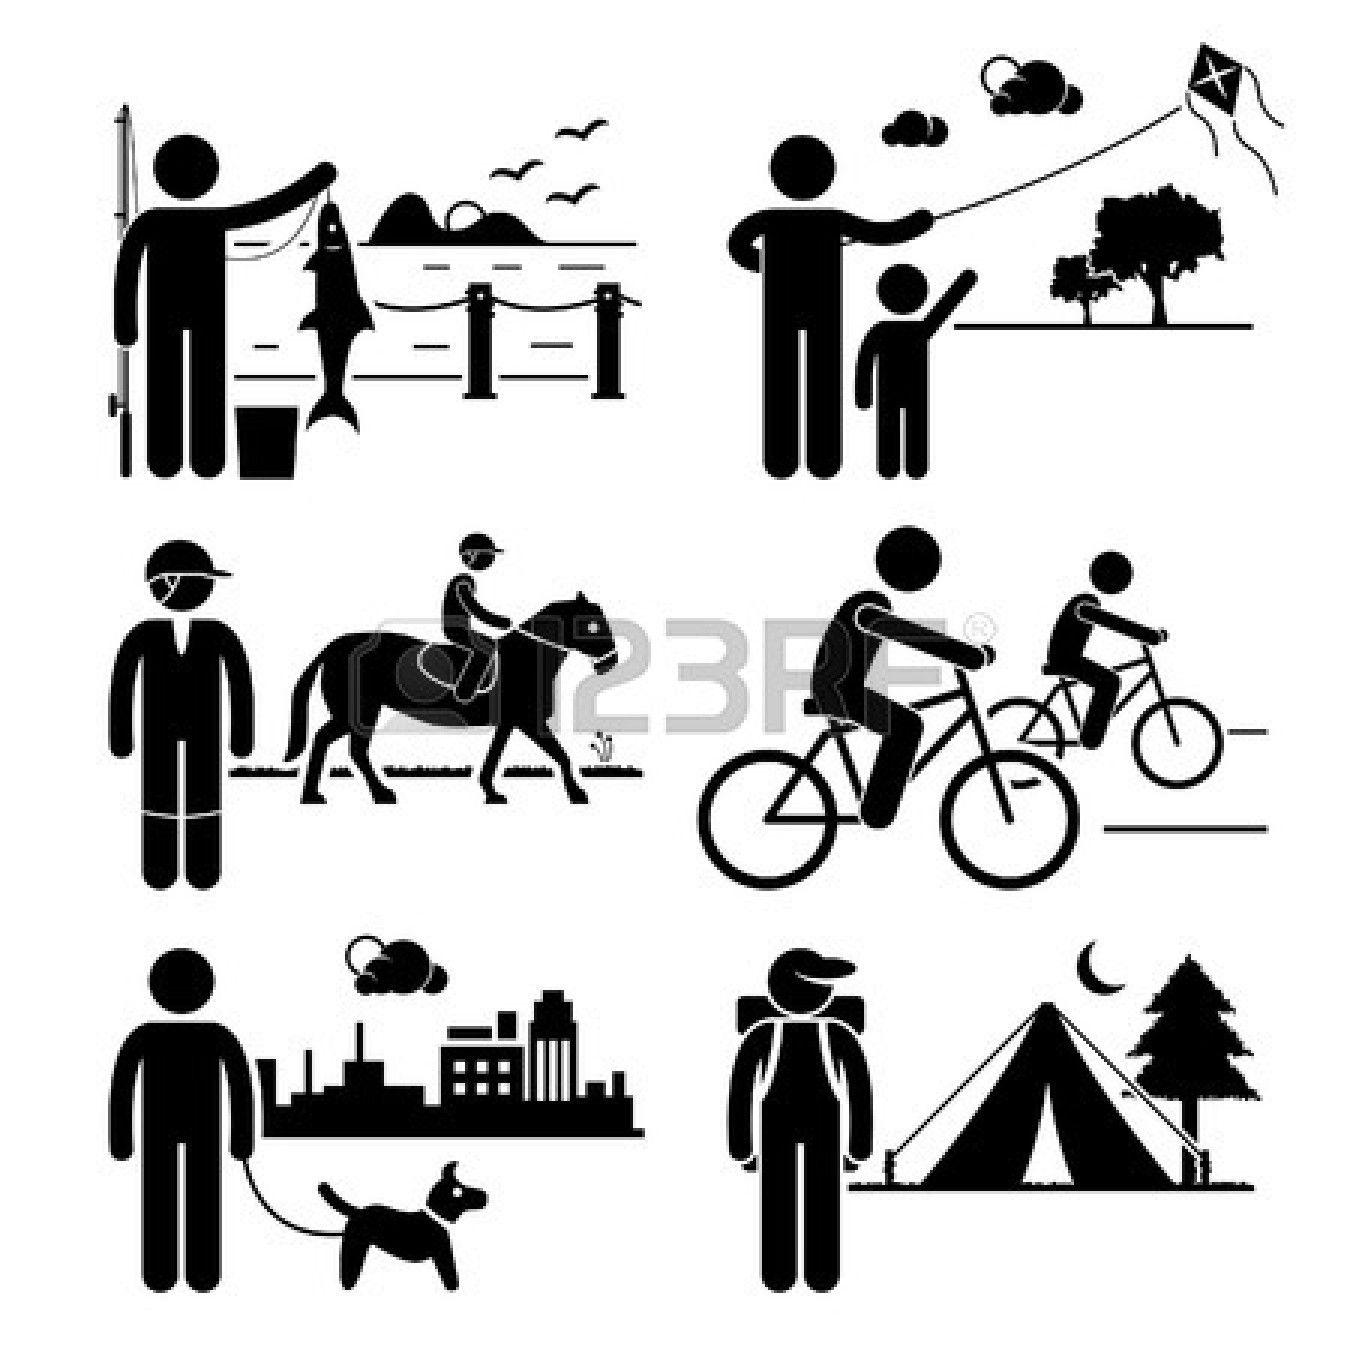 Recreational Outdoor Leisure Activities - Fishing, Kite ...